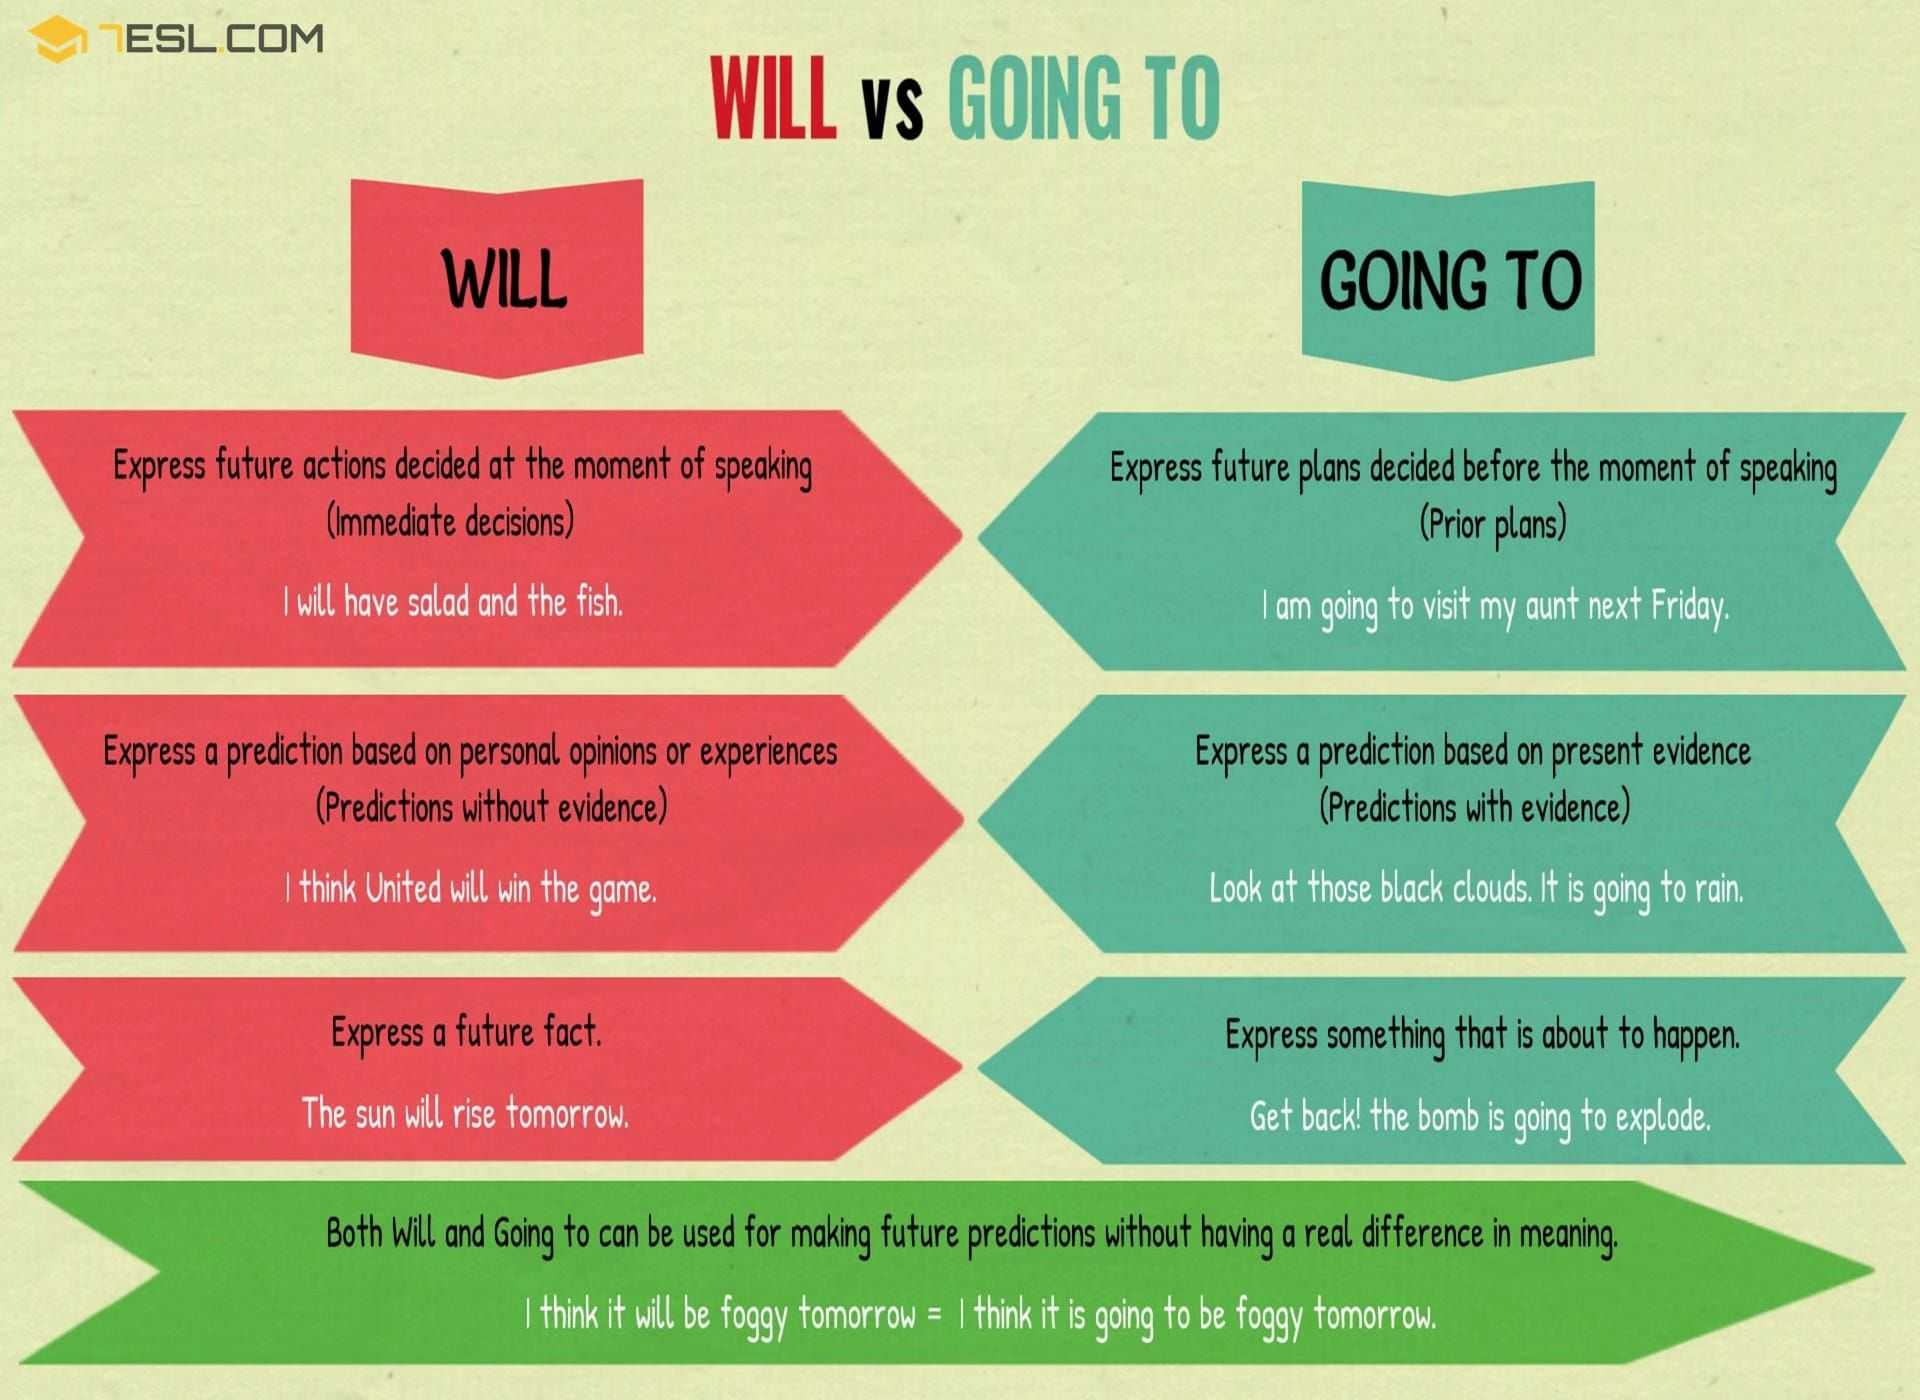 Will Vs Going To Differences Between Will And Going To 7esl Palavras Em Inglês Aulas De Inglês Dicas De Ingles